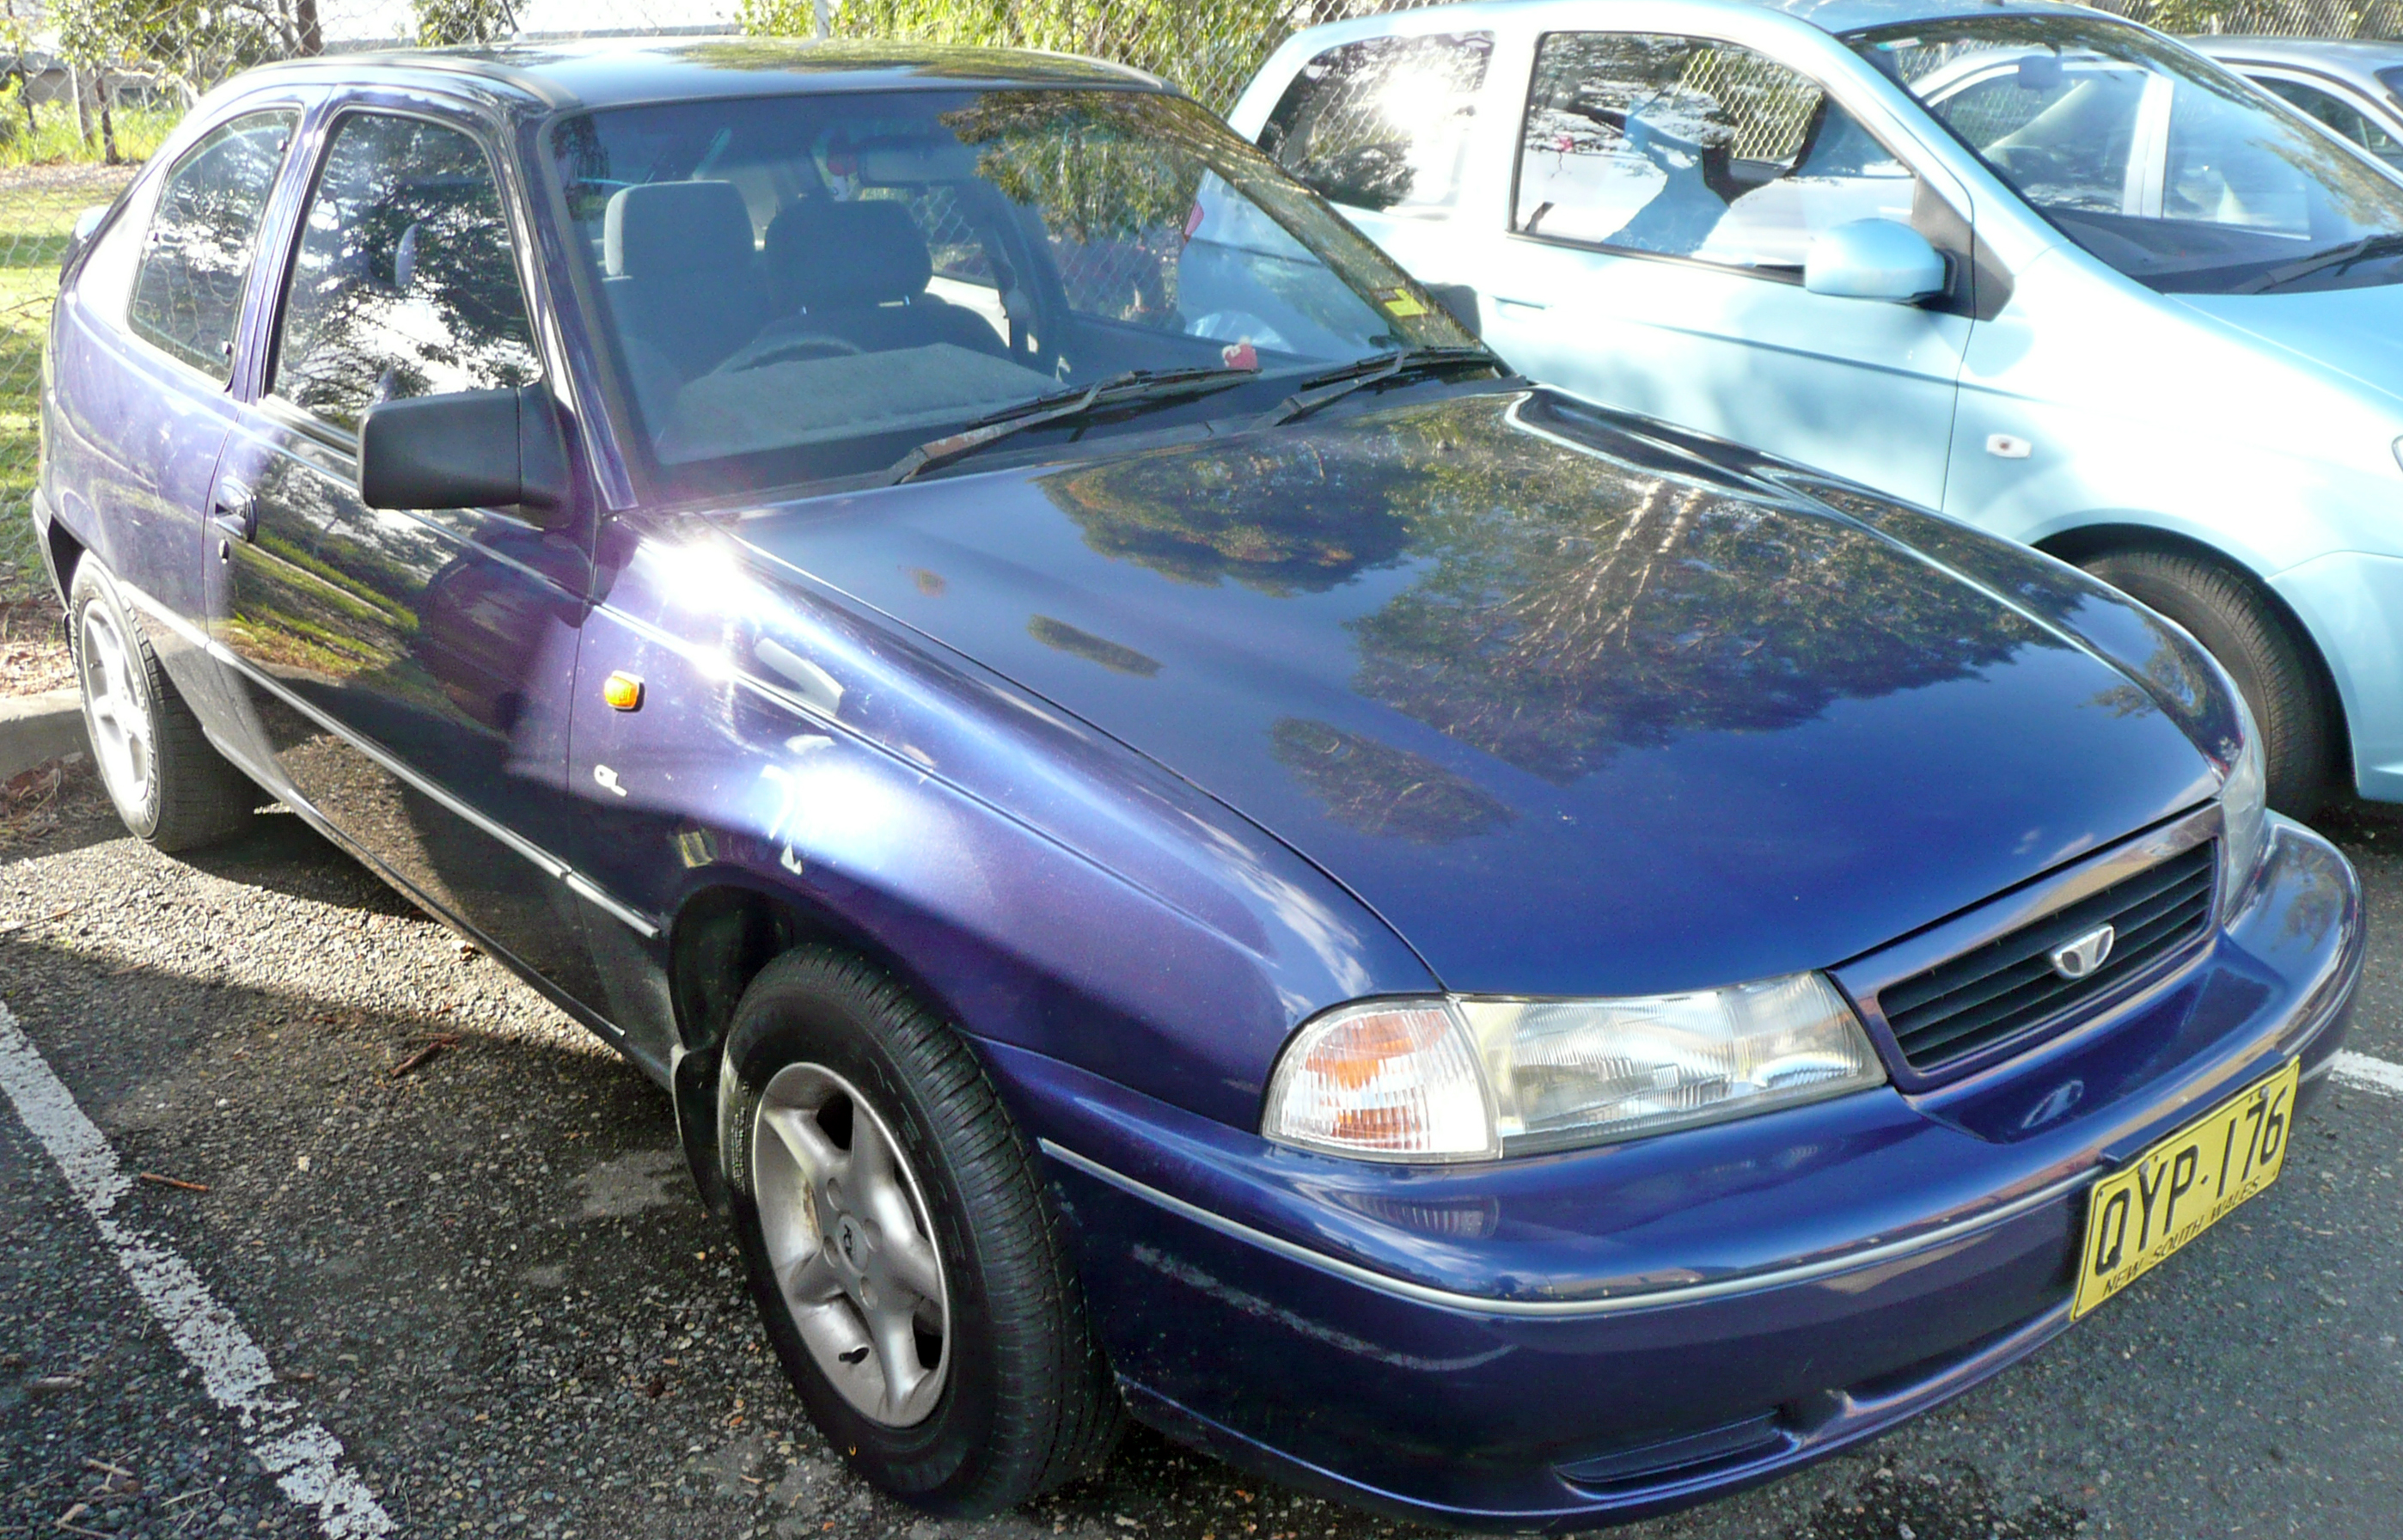 File:1995-1997 Daewoo Cielo GL 3-door hatchback 01.jpg - Wikimedia